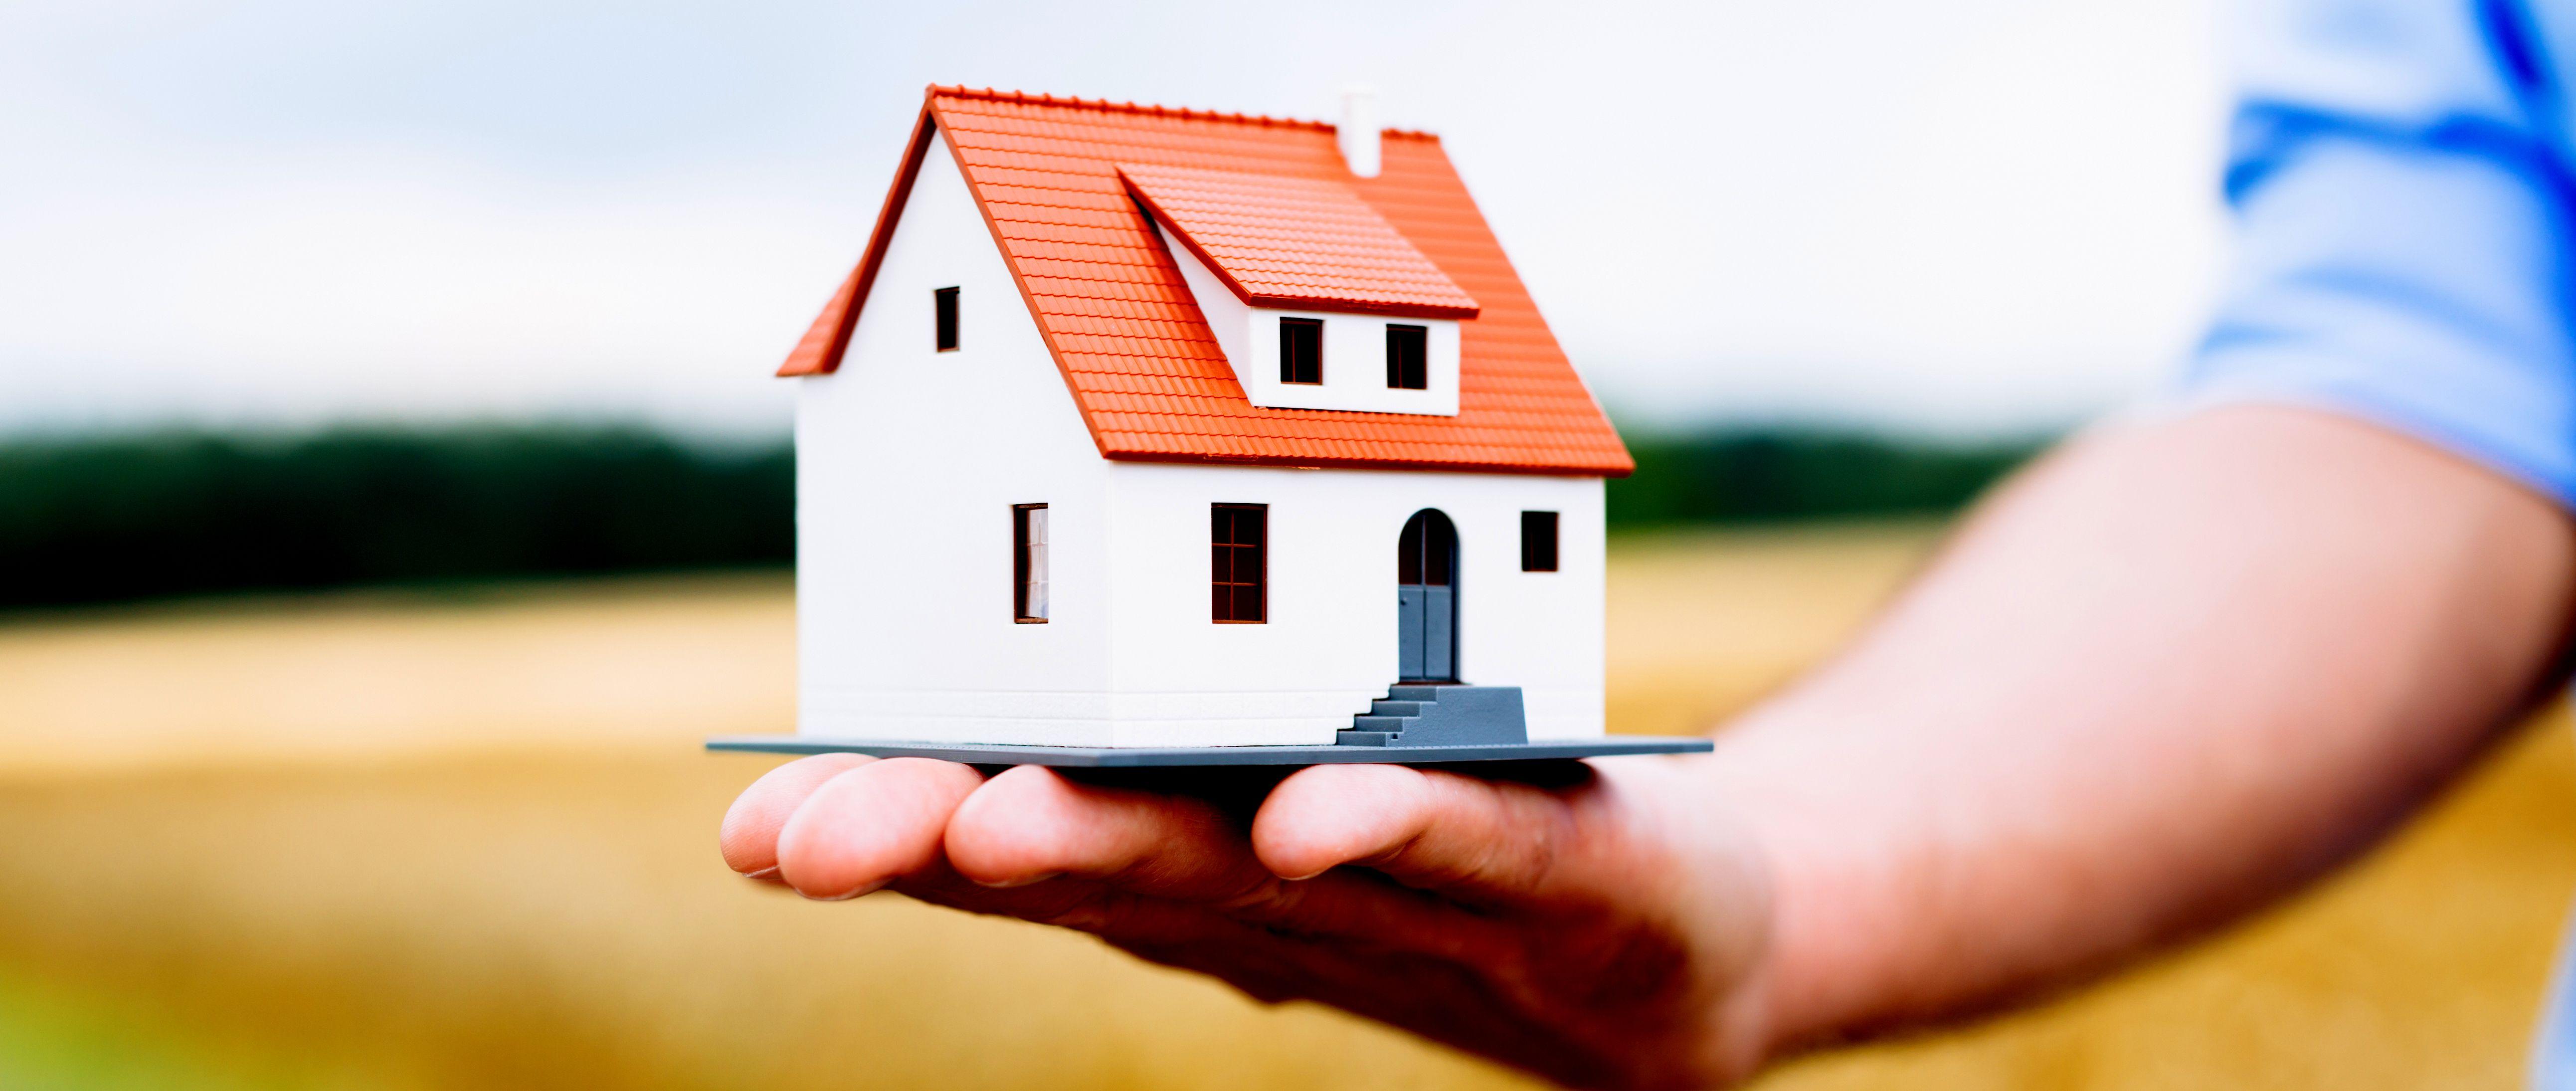 California Homeowners Insurance Home improvement loans